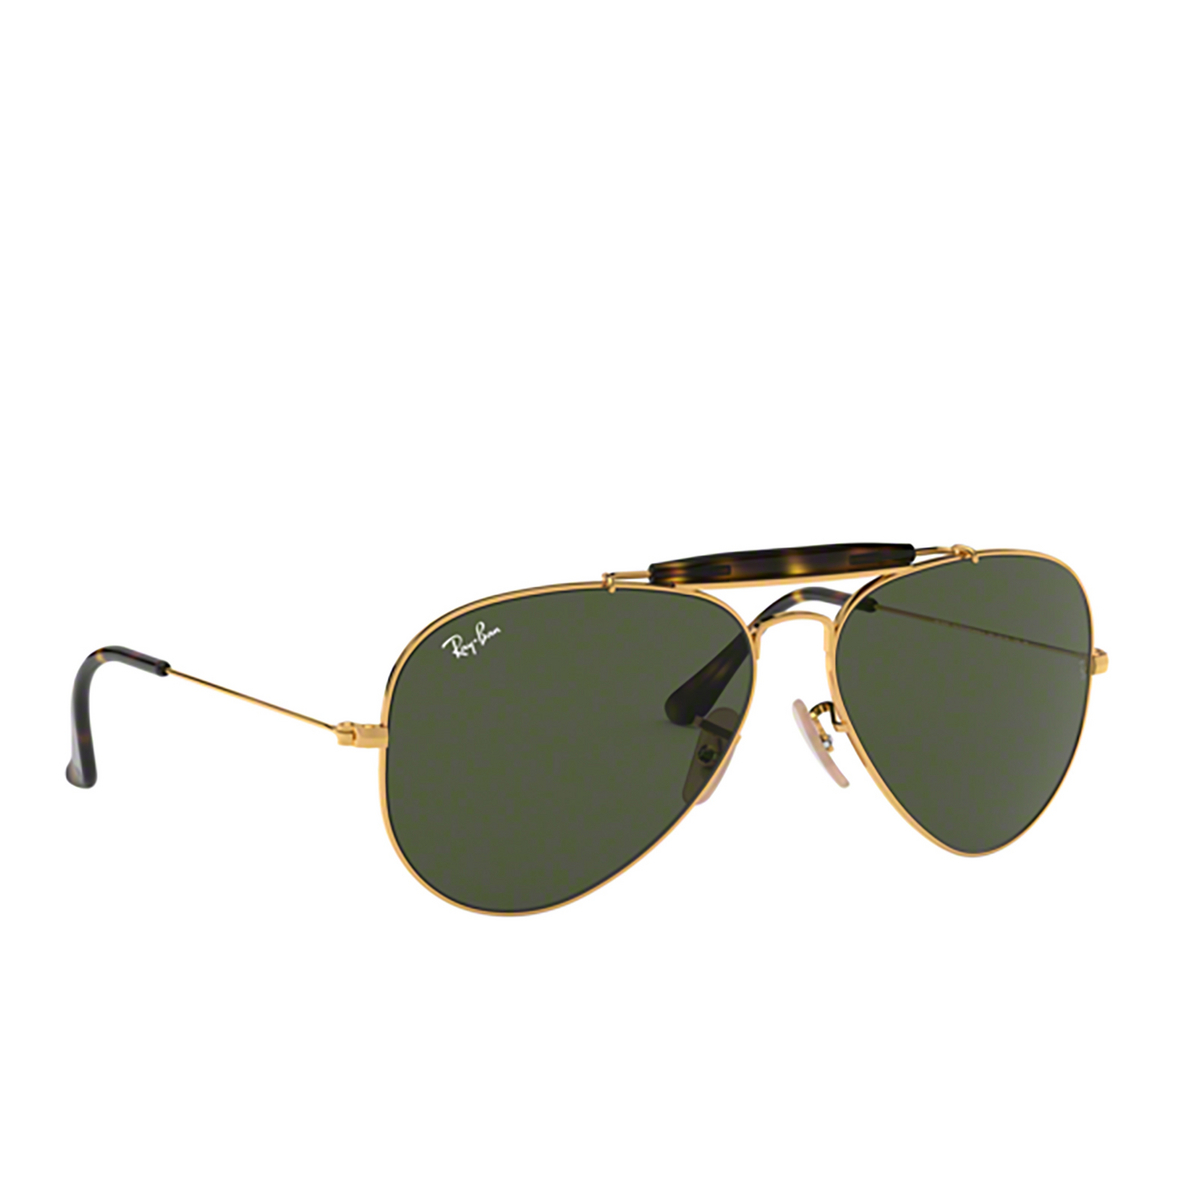 Ray-Ban® Aviator Sunglasses: Outdoorsman Ii RB3029 color Arista 181 - 2/3.